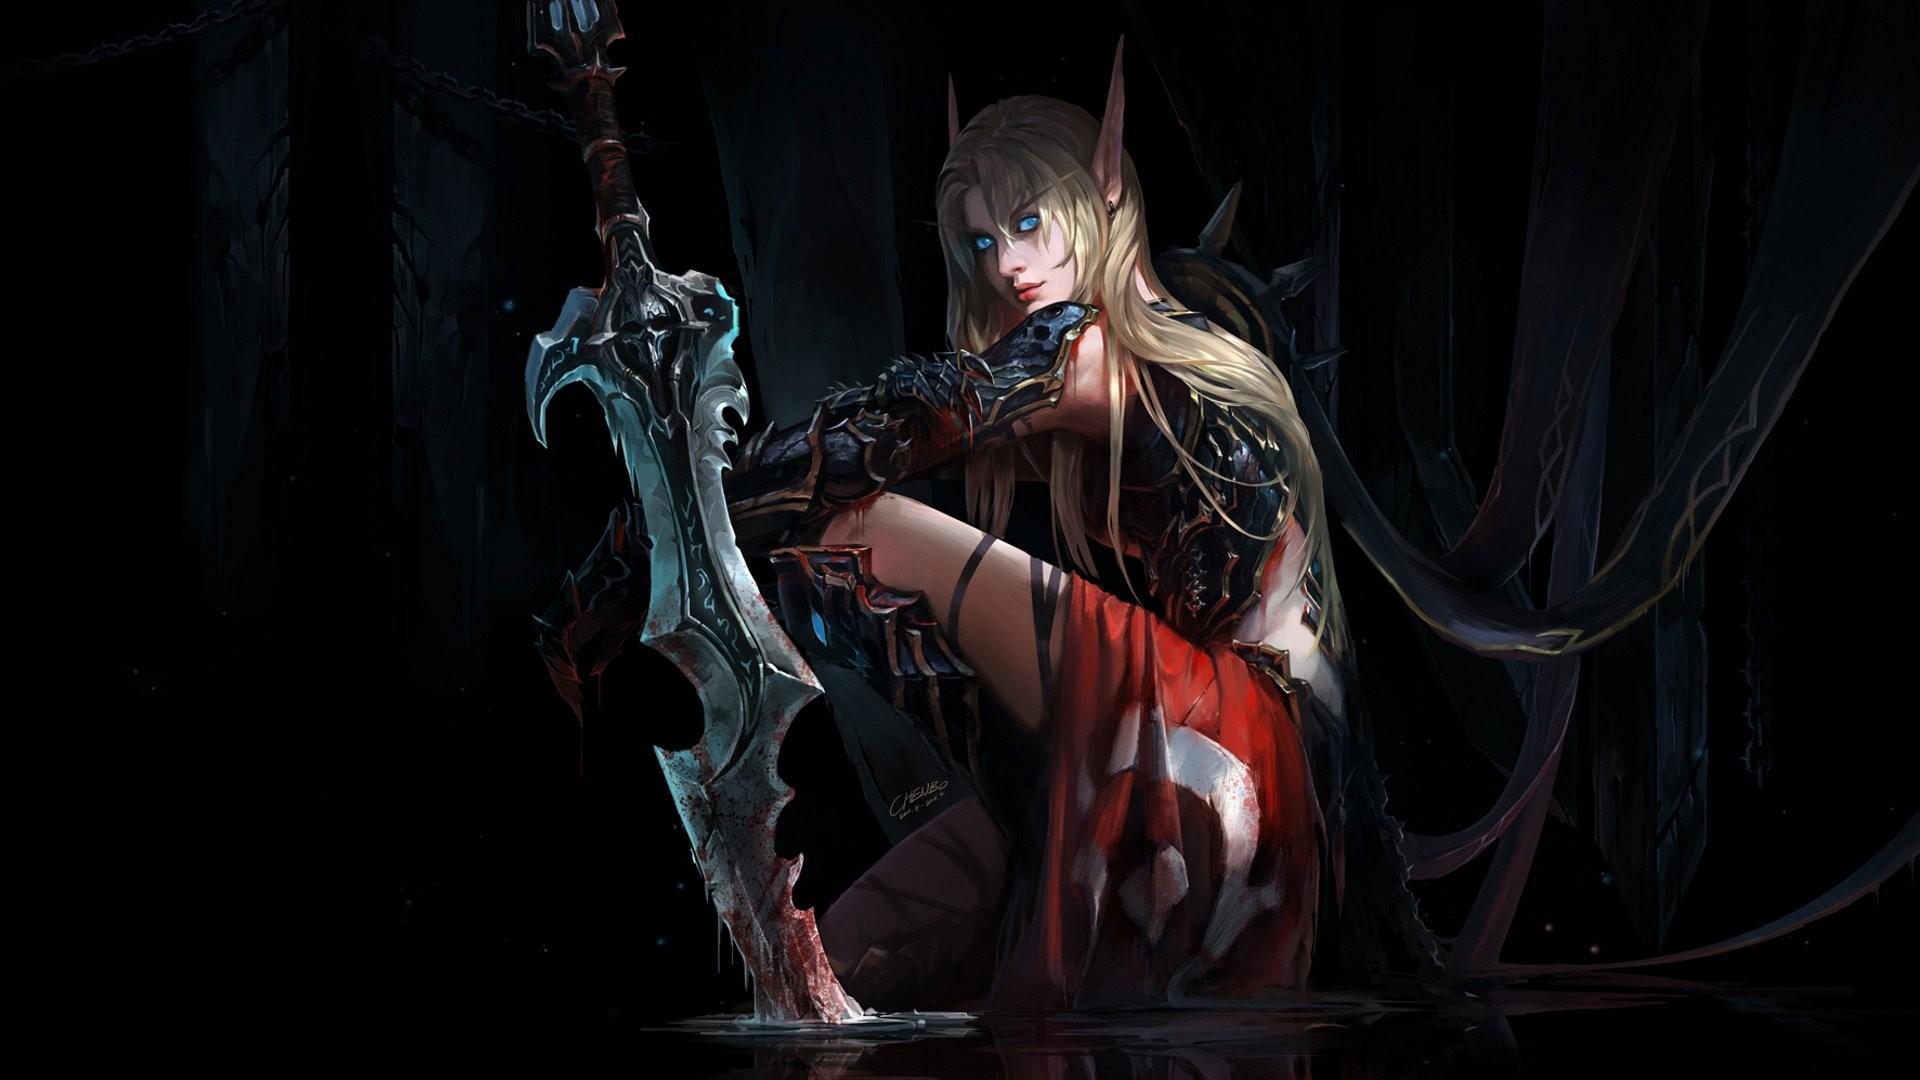 Blizzard WarCraft art drawing fantasy girl elf blood elf blonde blonde hair  blue eyes Death Knight the sword the endless dark eternal darkness art  wallpaper …